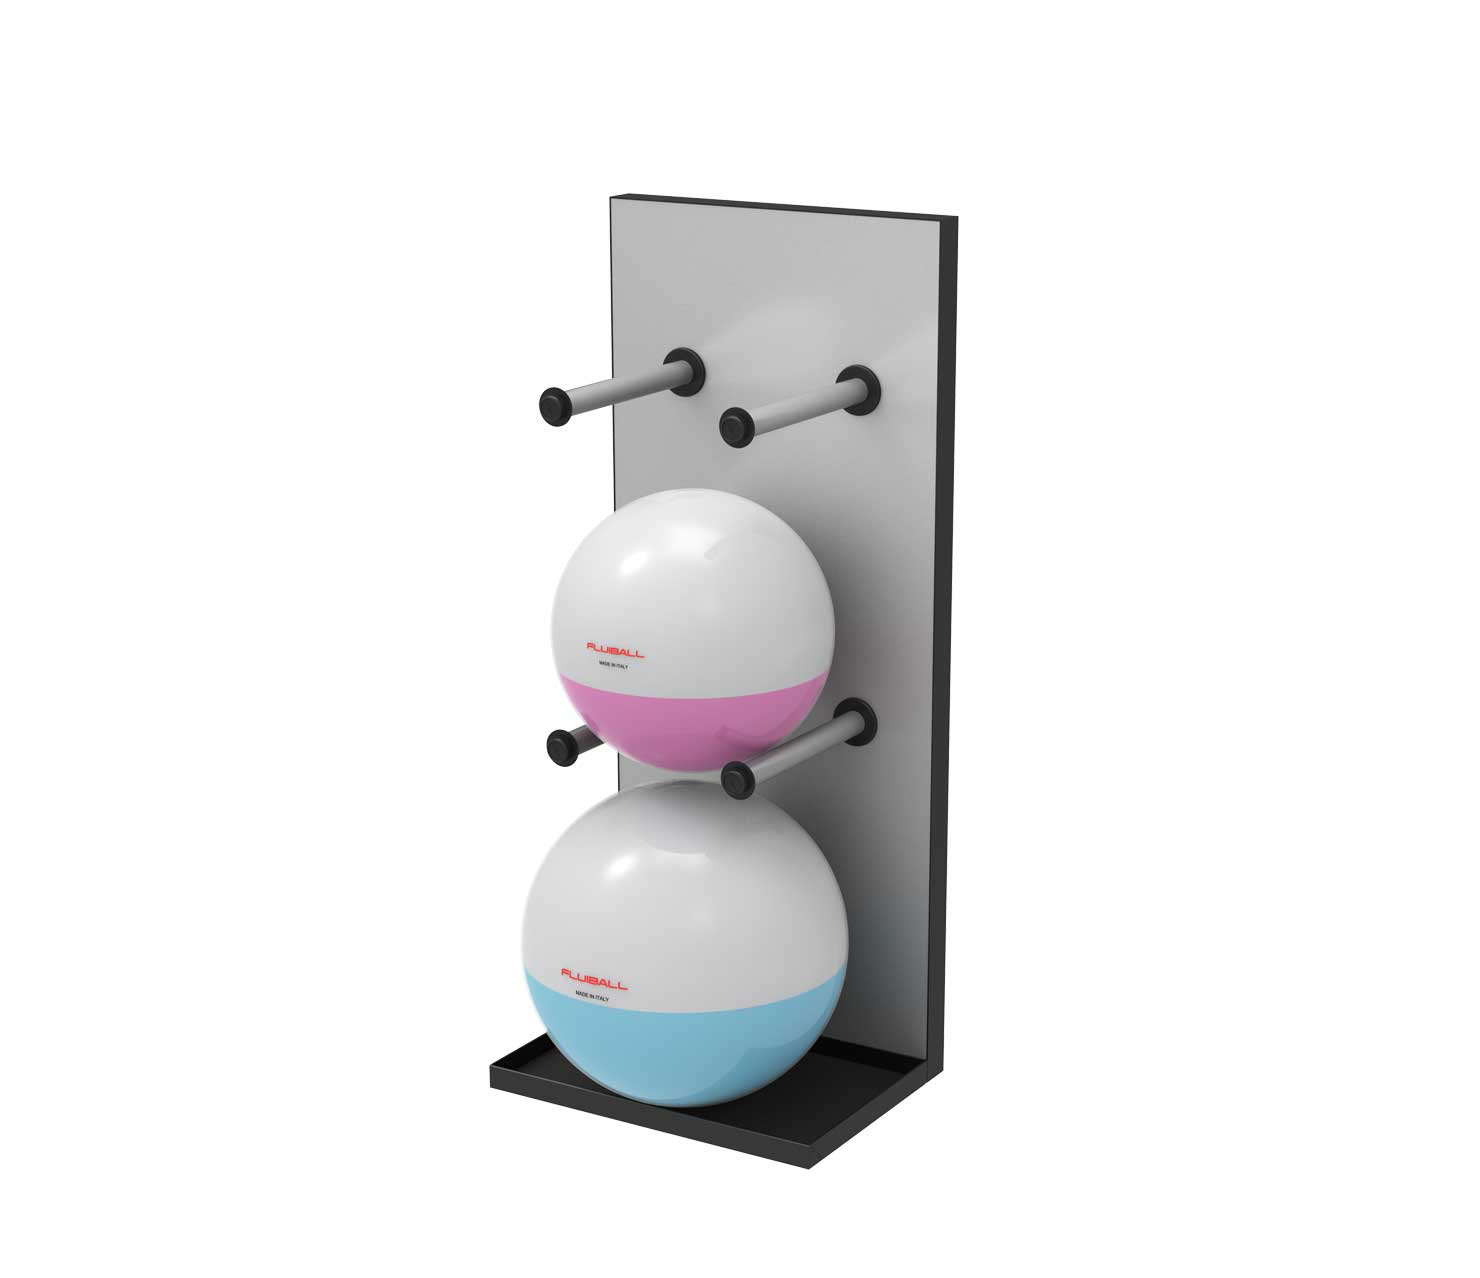 RX1335 Balance ball Storages